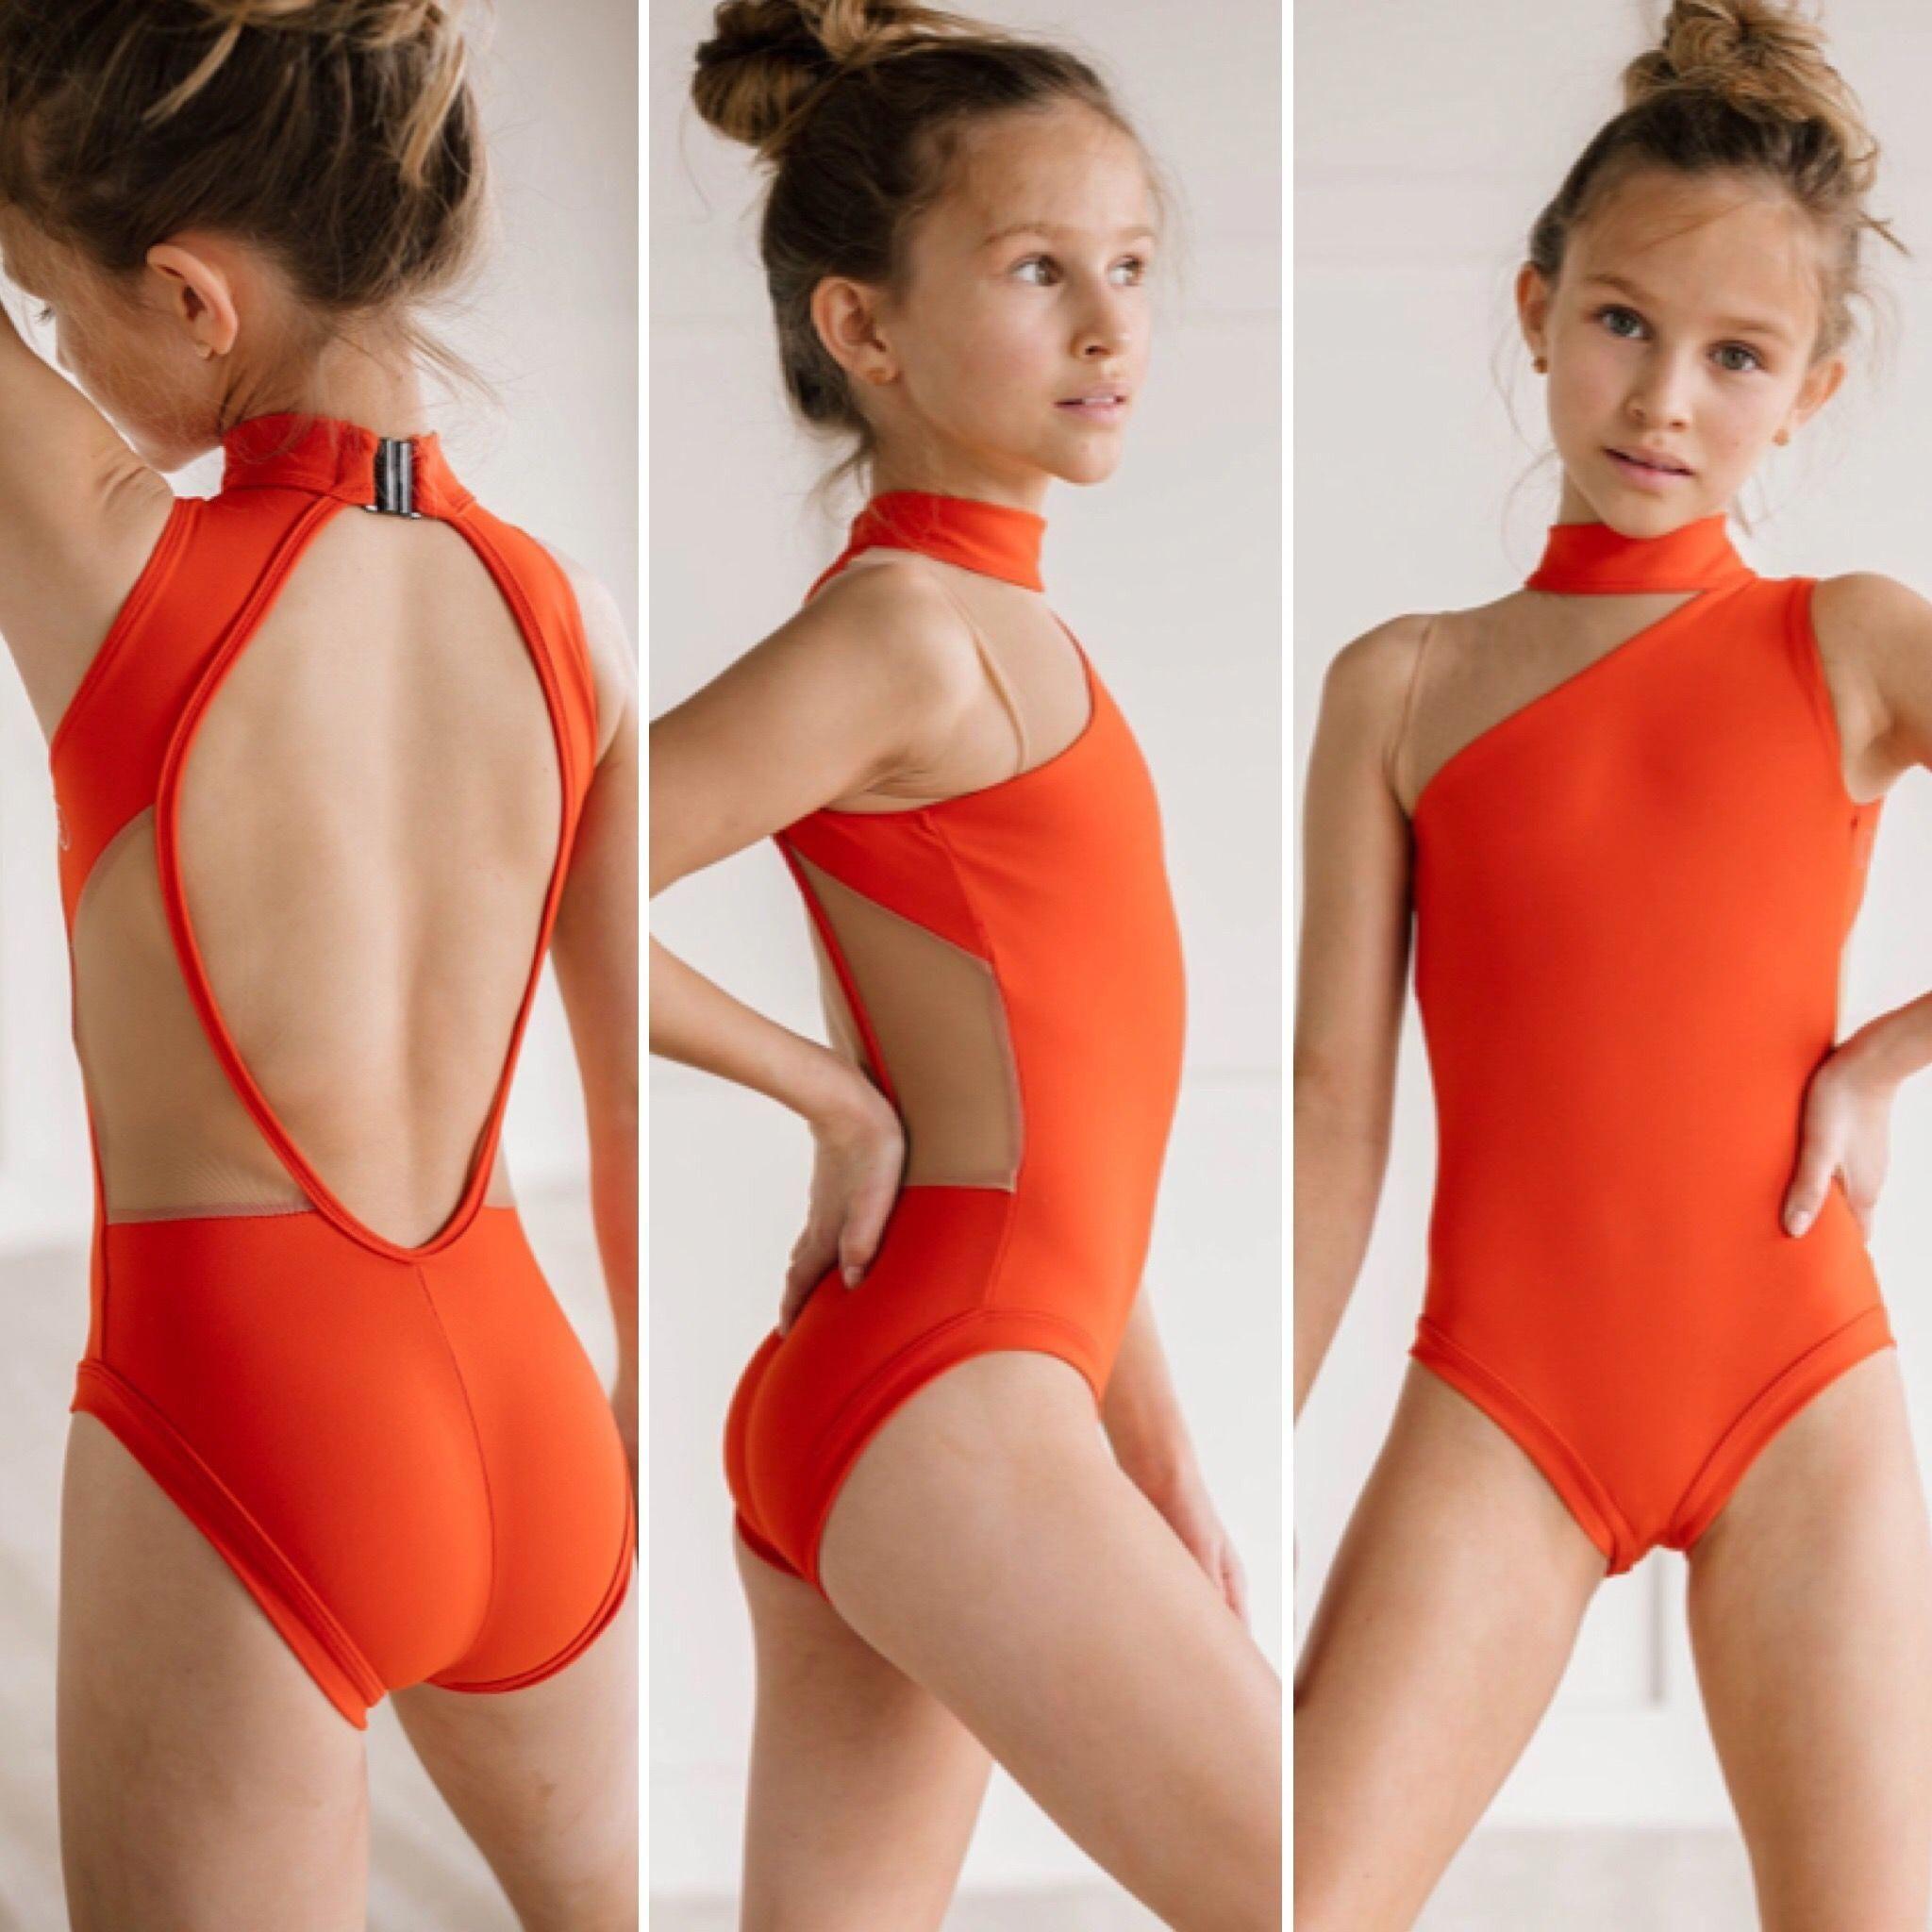 Bottoms Set Gym Leotards Kids Girls Crop Top Tankini Outfit Ballet Dance Tops